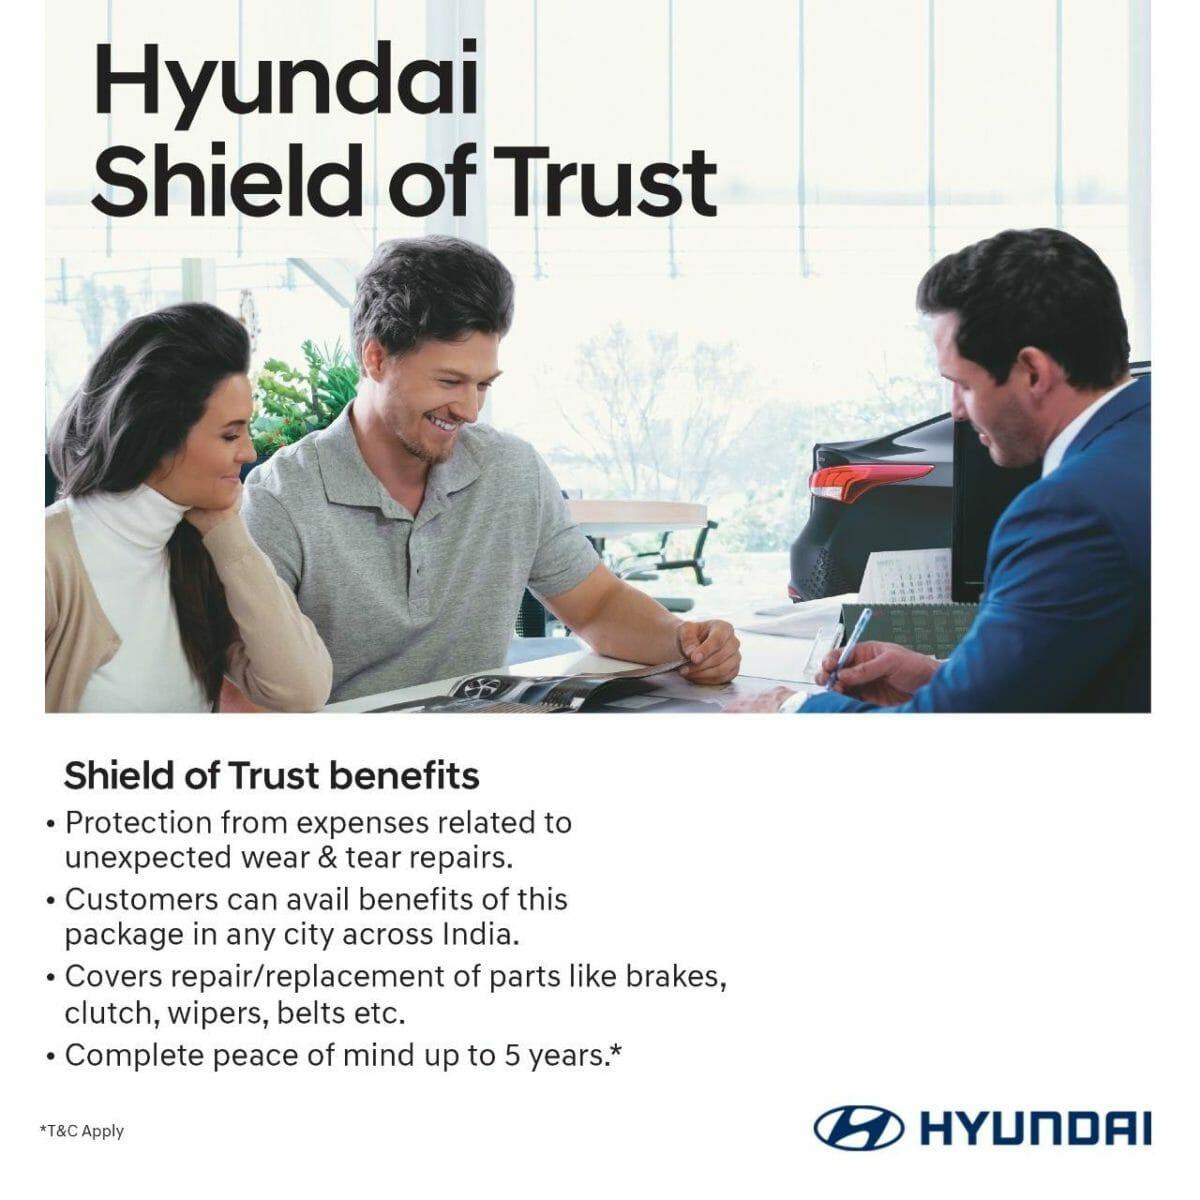 Hyundai shield of trust